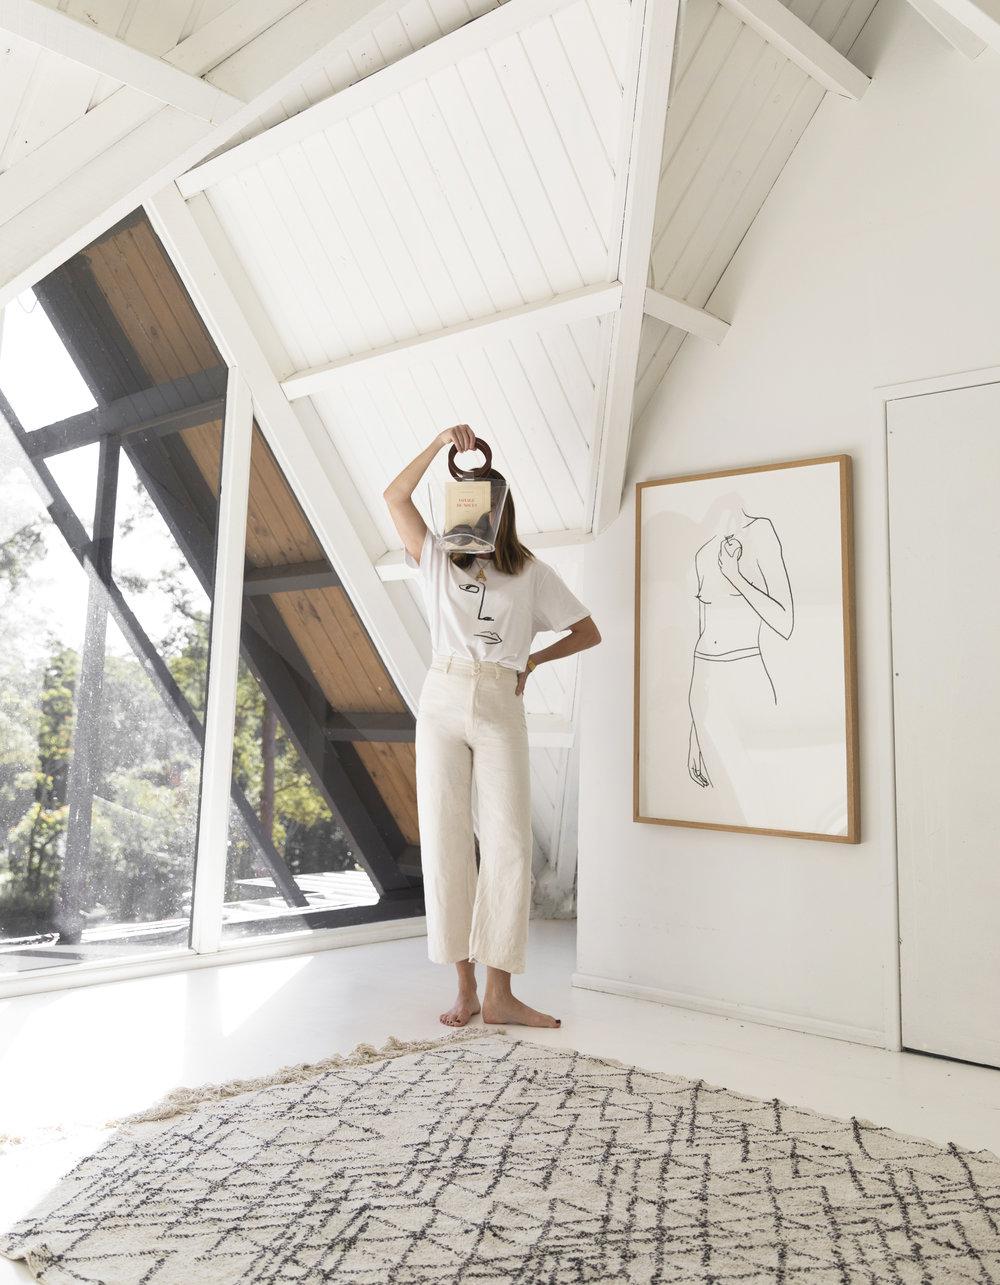 Amanda-Shadforth-Artist-Art-Studio.7.jpg